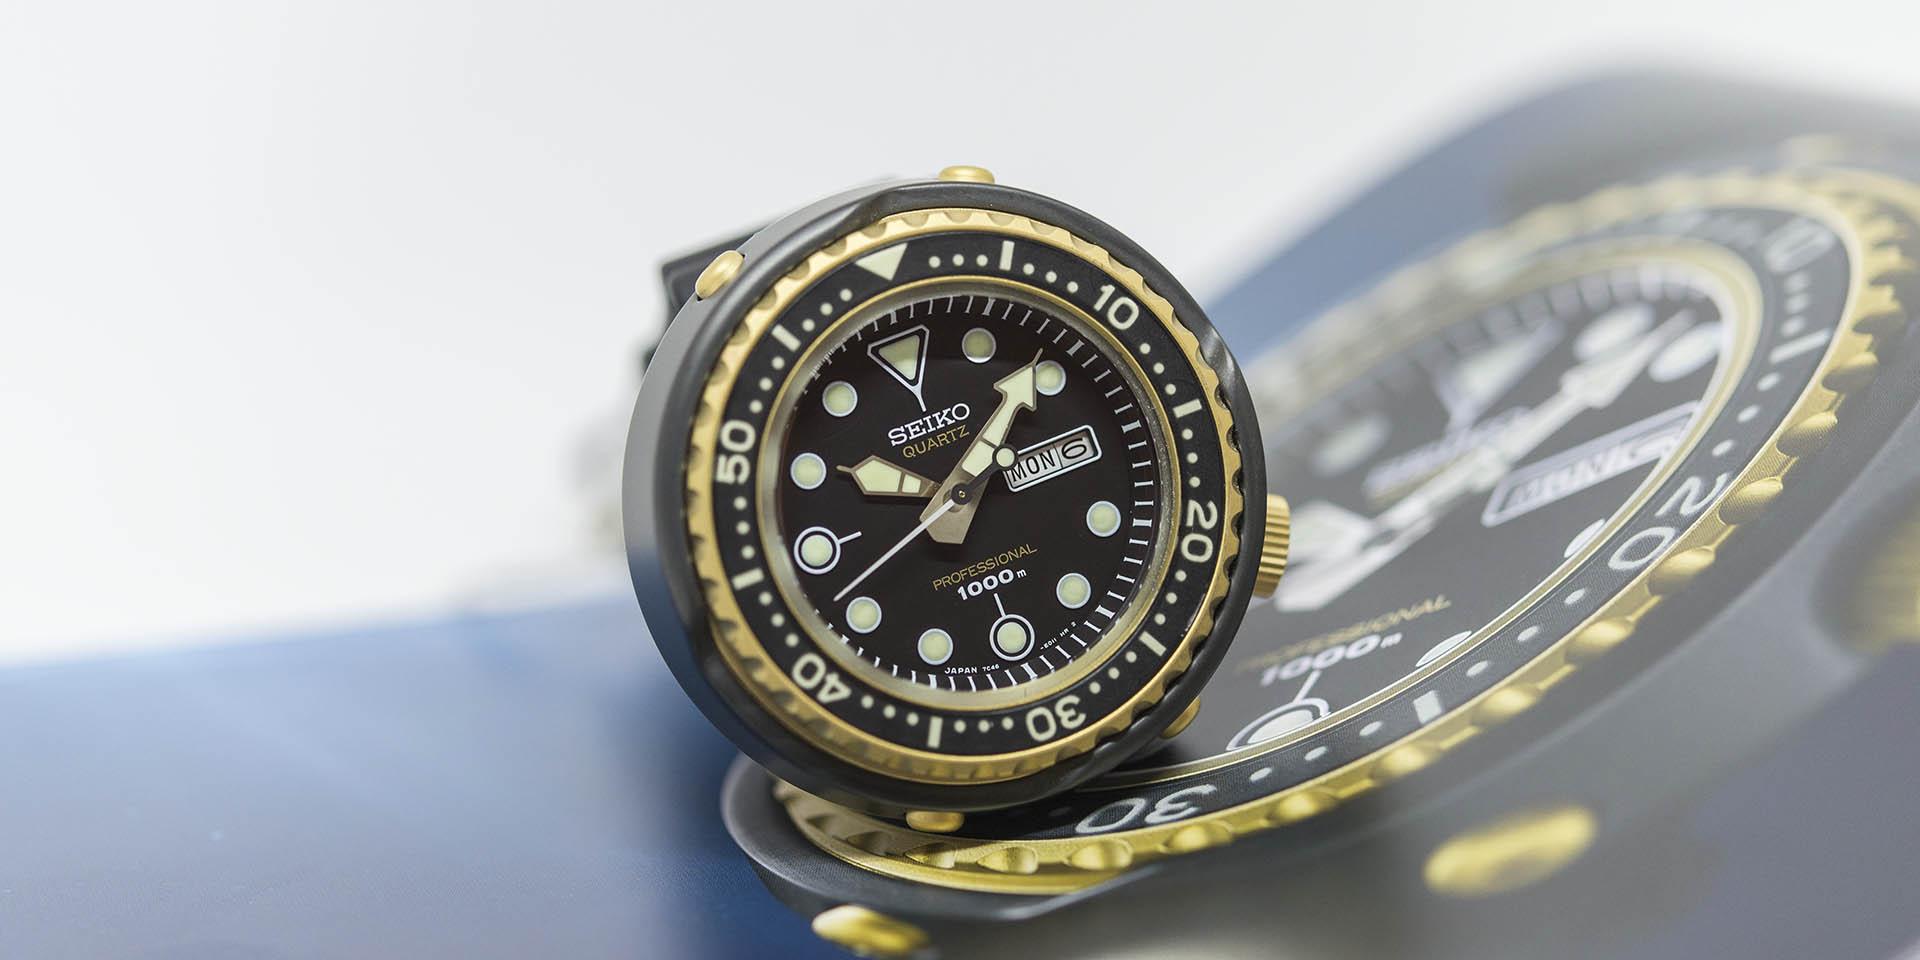 s23626-seiko-prospex-1000m-limited-edition-1.jpg